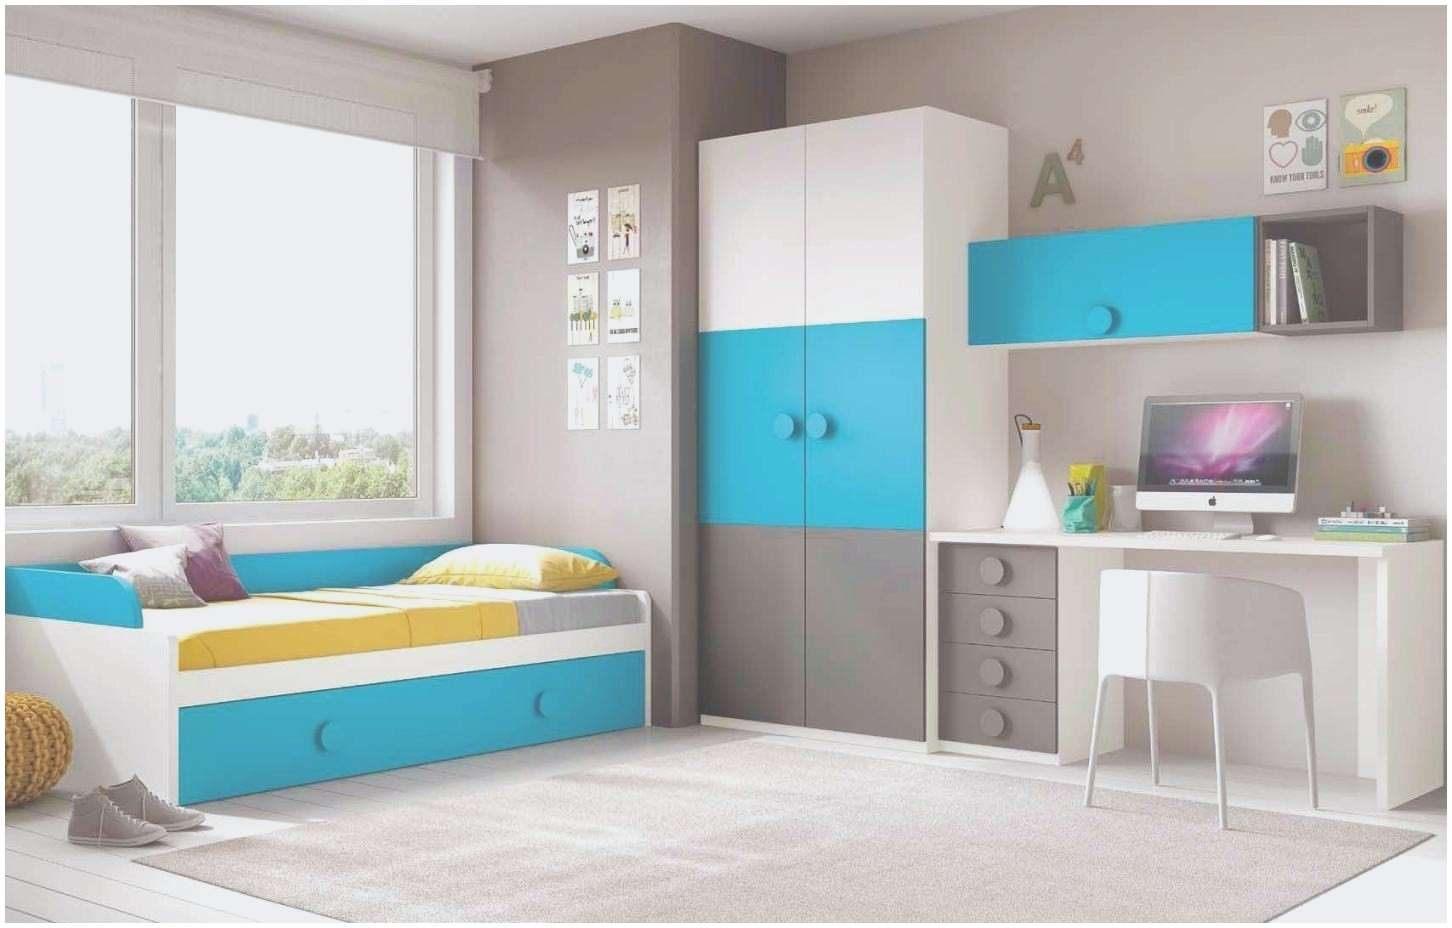 Lit Ado Pas Cher De Luxe 57 Mezzanine Ado Concept Jongor4hire